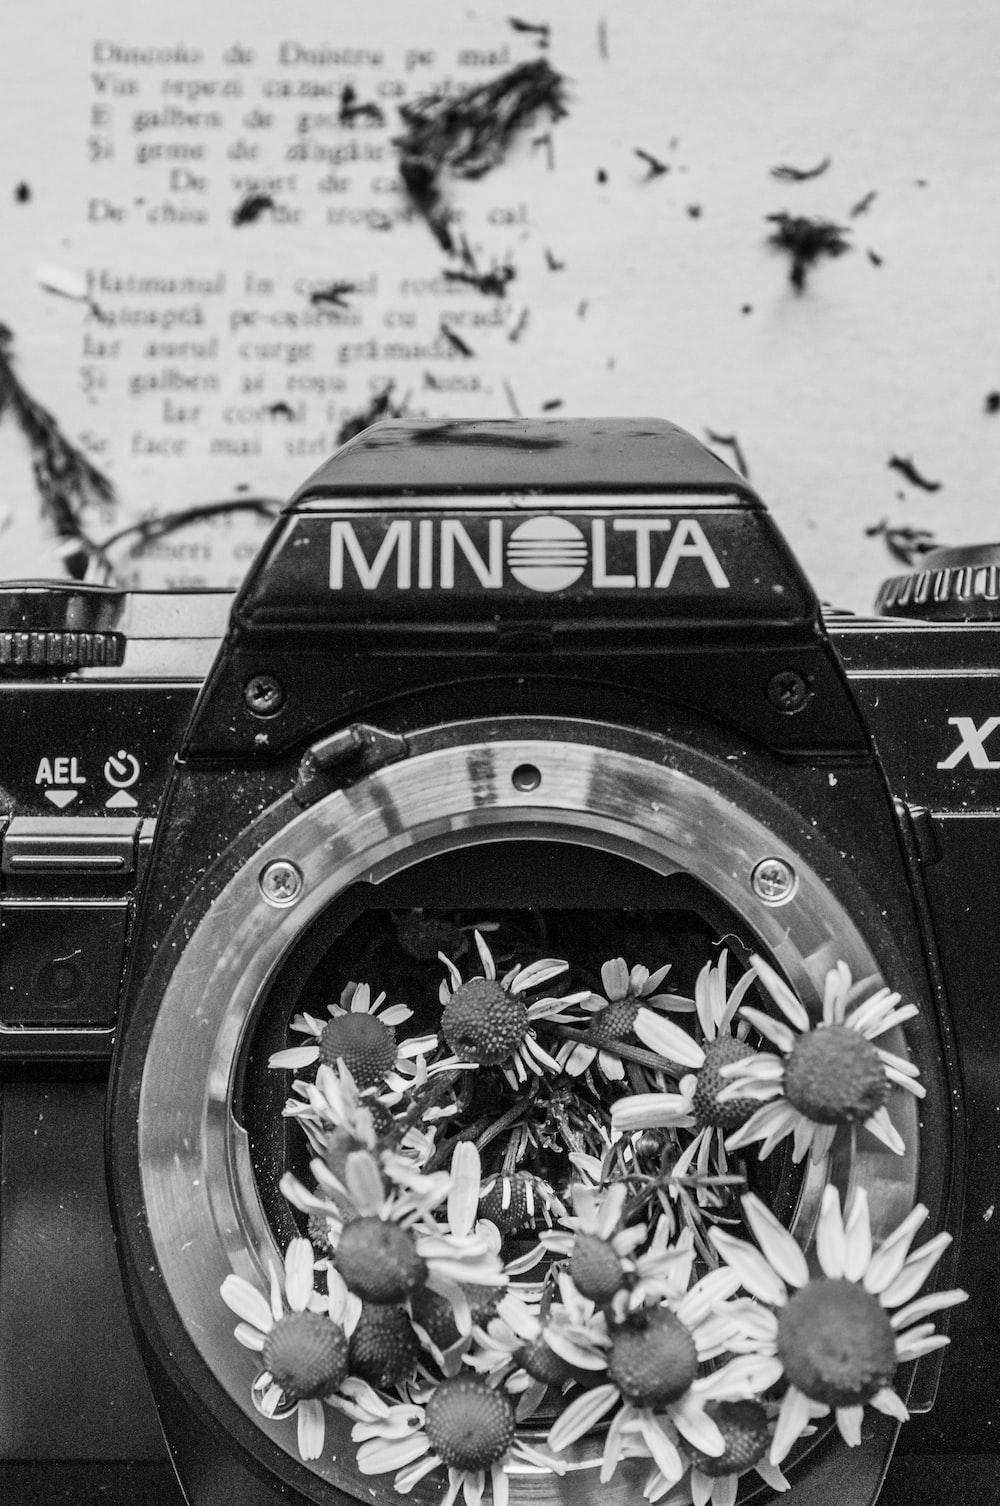 grayscale photo of nikon dslr camera